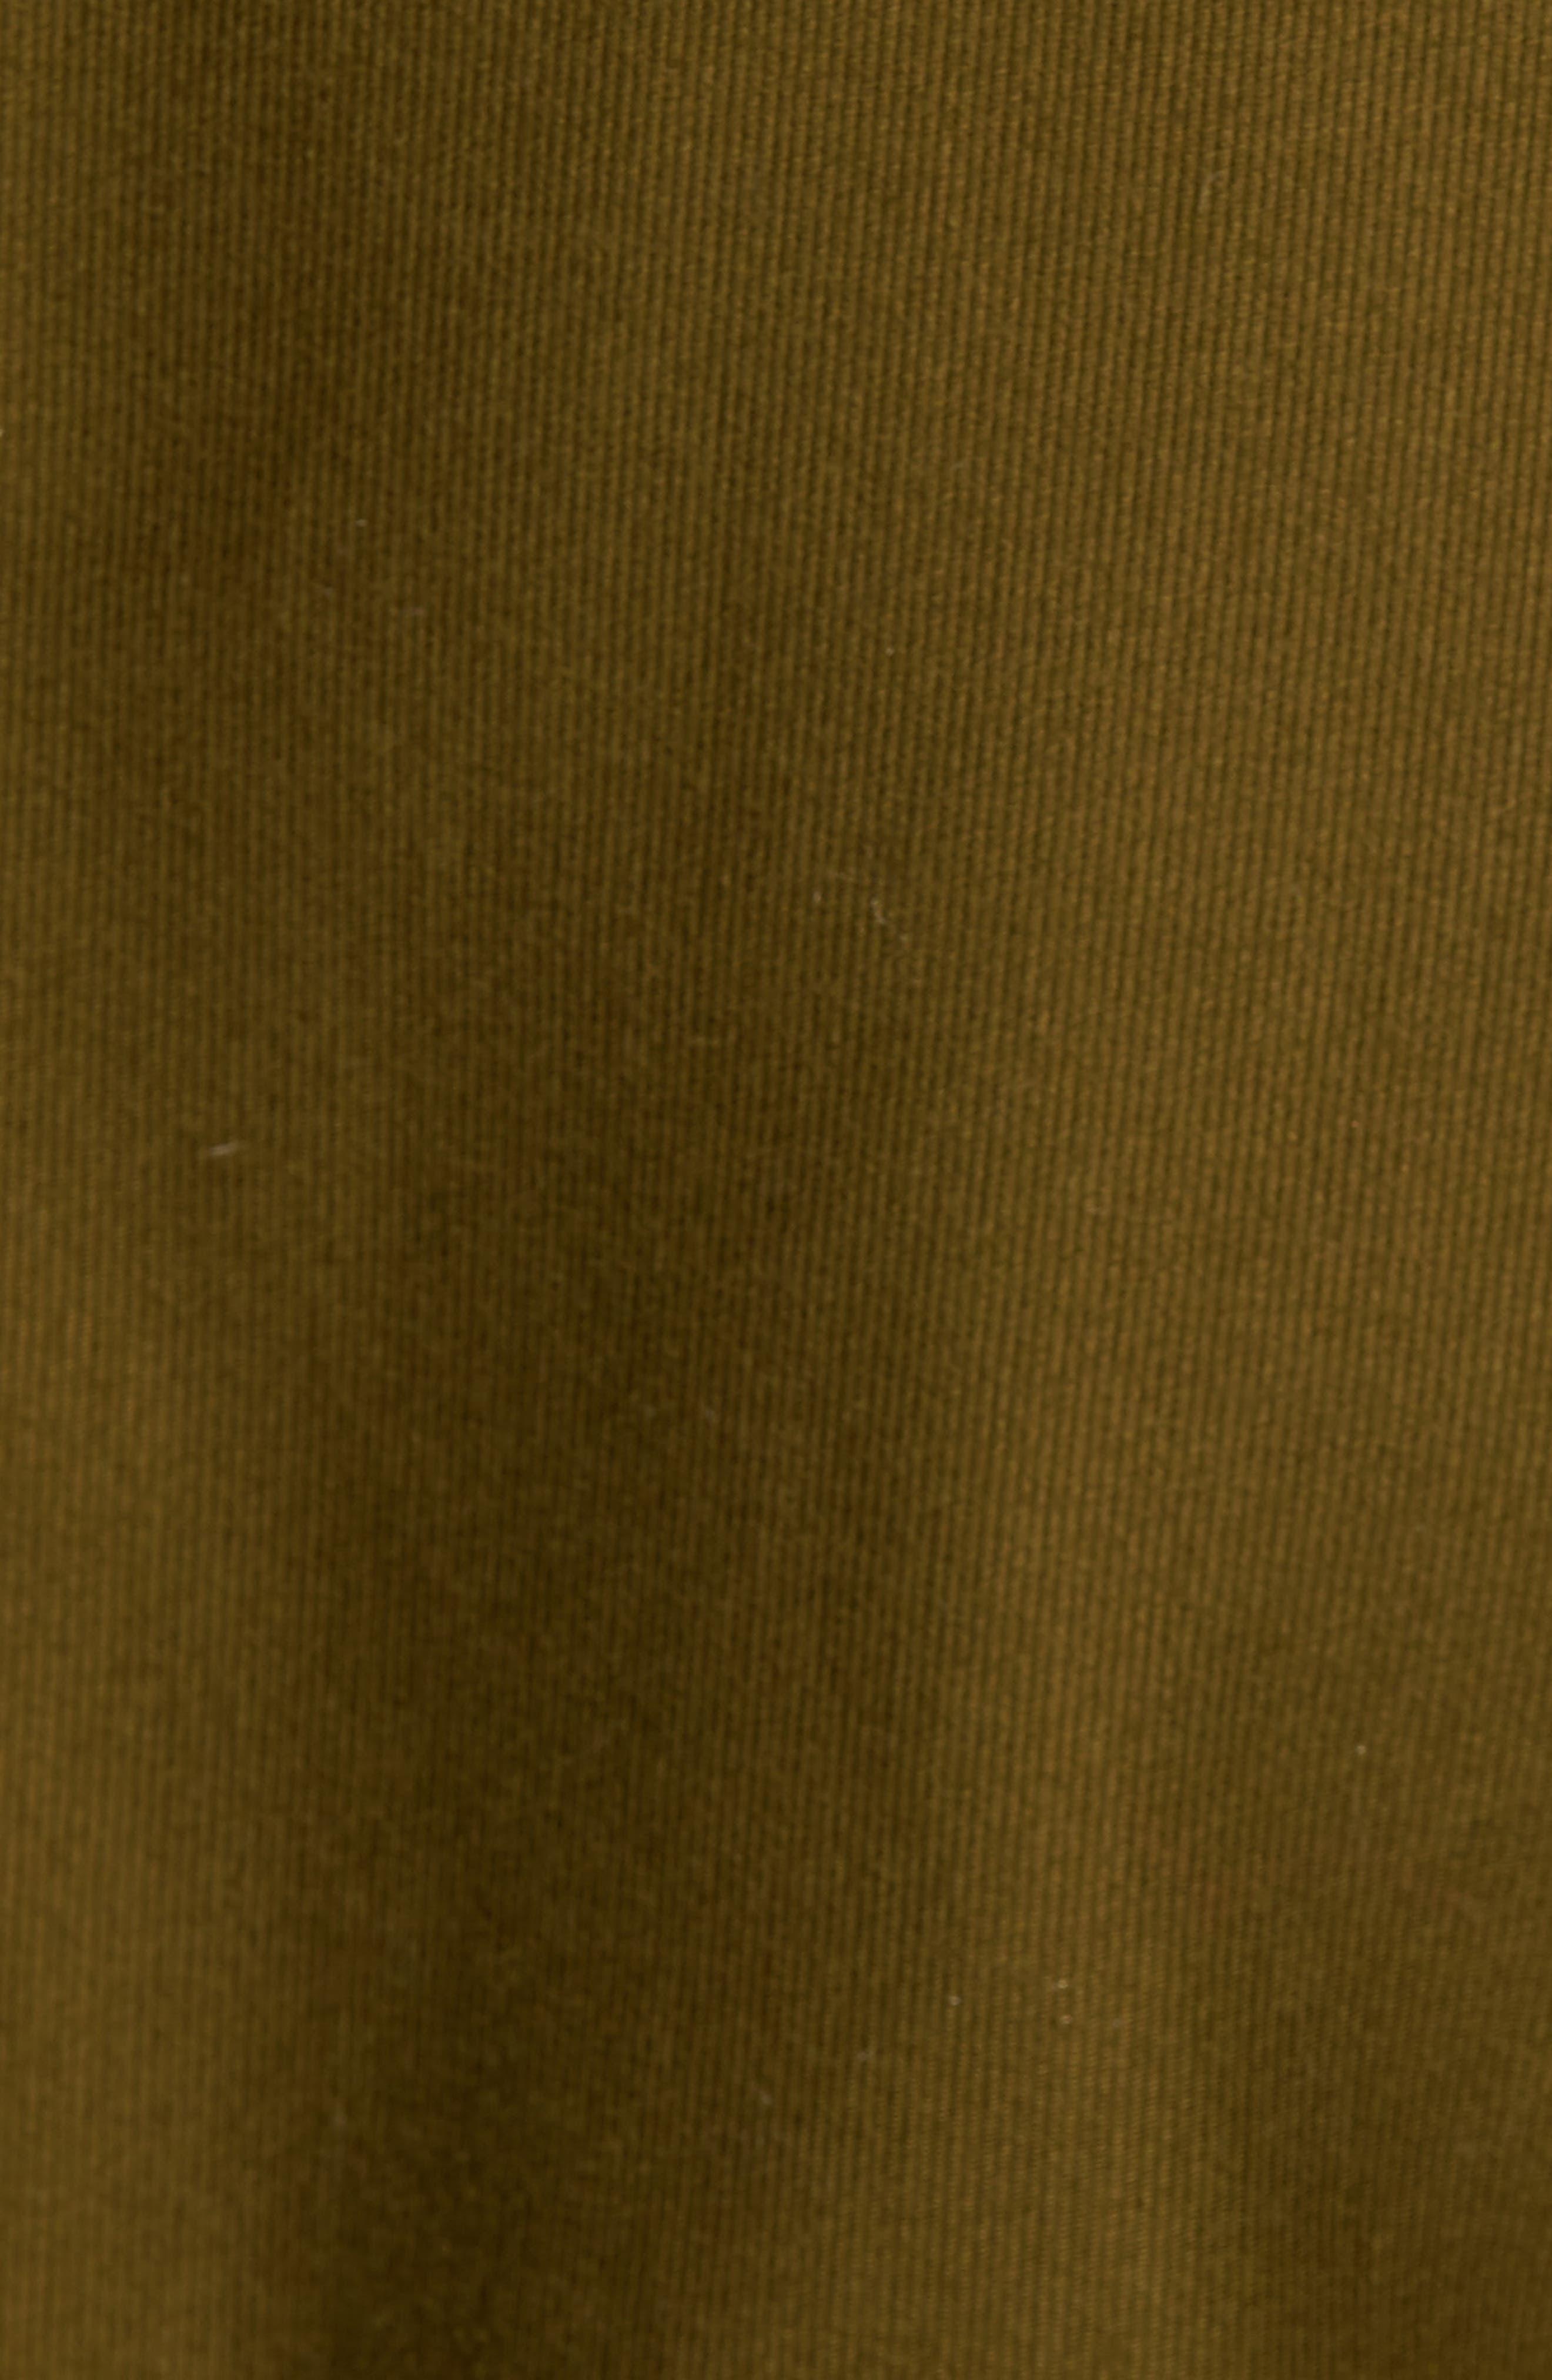 Bedford Corduroy Goose Down Jacket with Faux Fur Trim,                             Alternate thumbnail 6, color,                             352